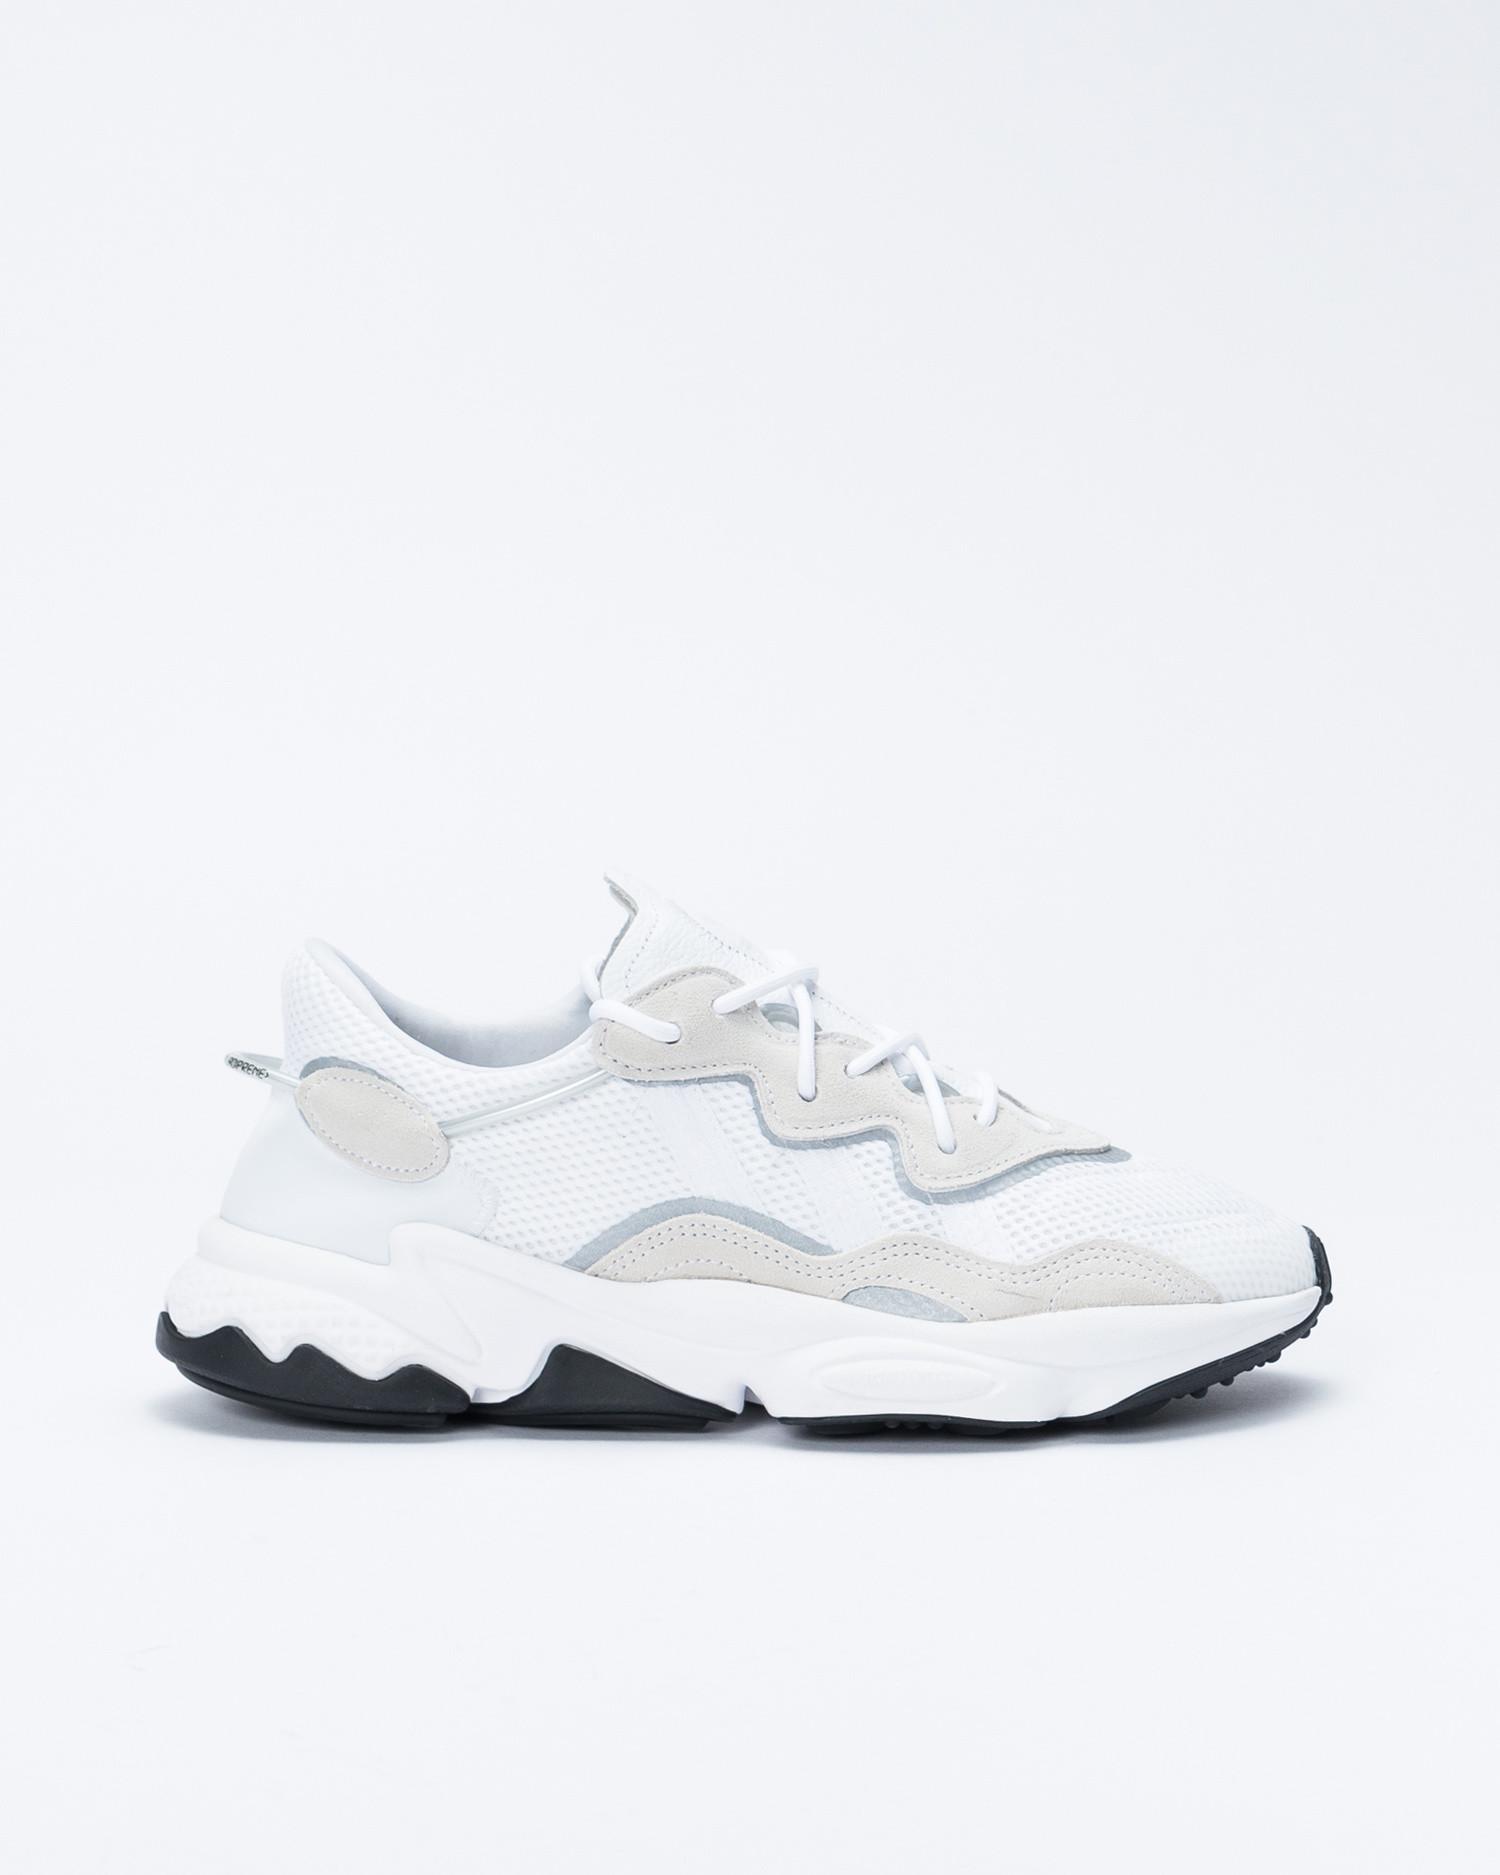 adidas Ozweego Cloud White/Cloud White/Core Black